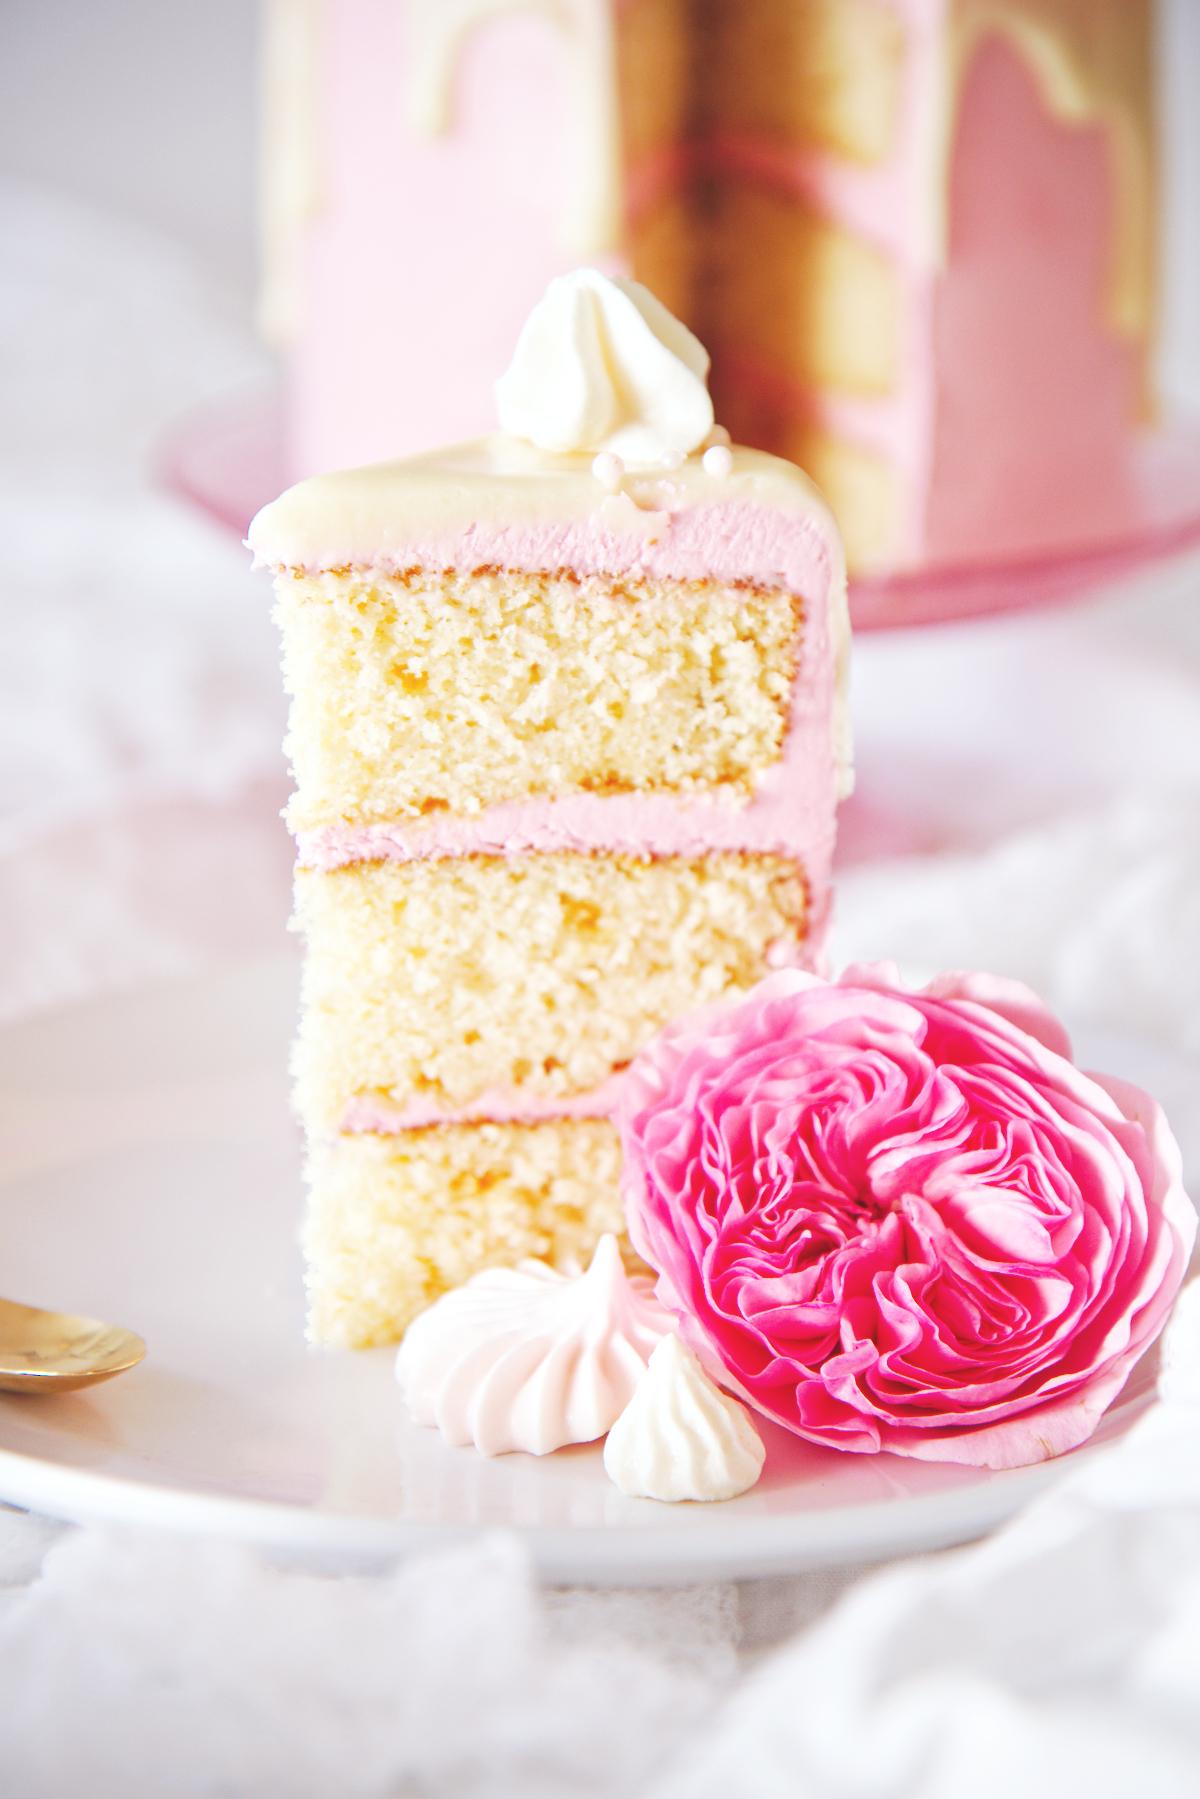 Ginger Malted Vanilla and Hibiscus Cake | La Pêche Fraîche